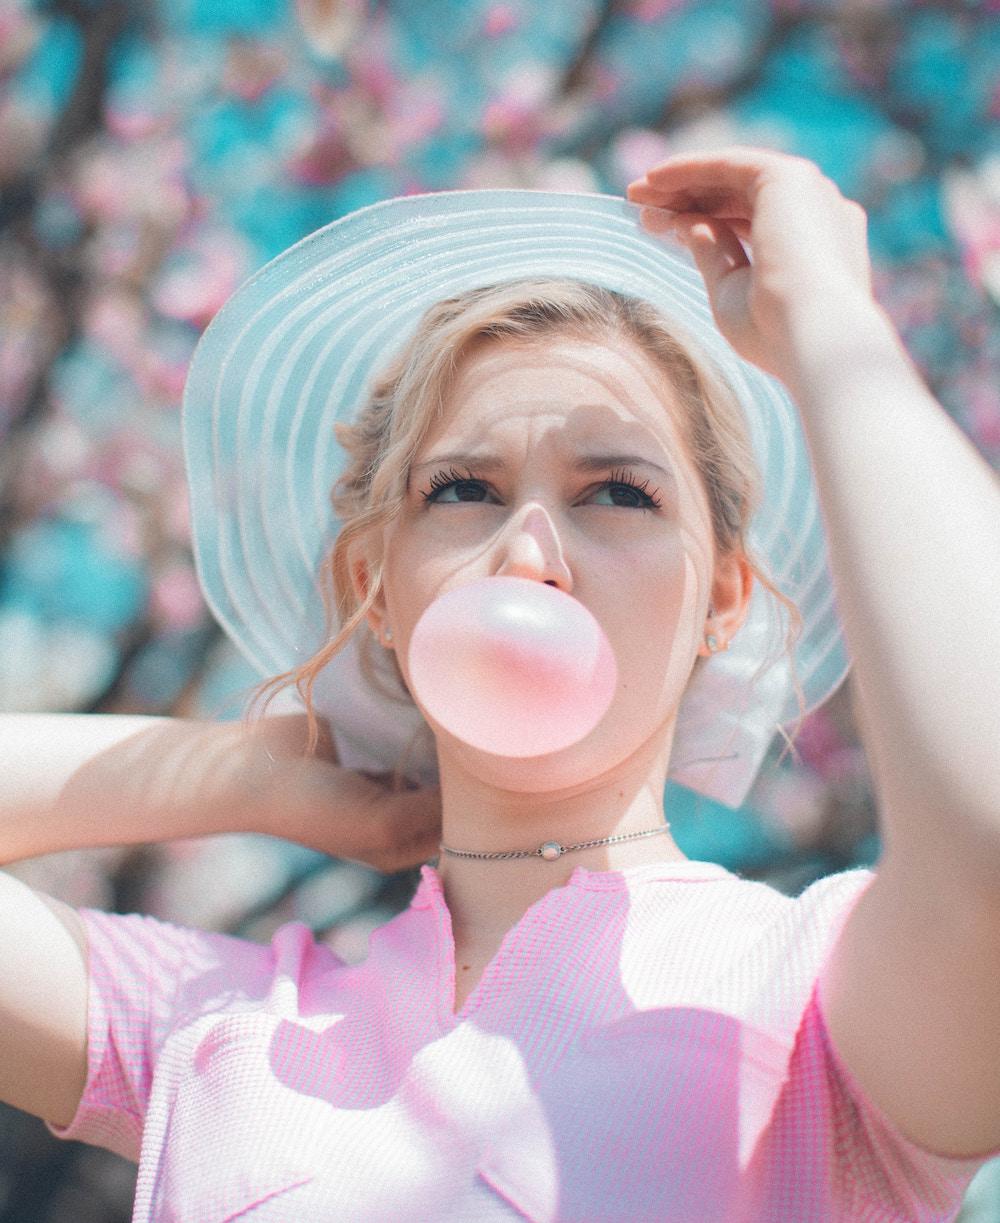 Babor-Skinovage-PX-Vita-Balance-Lipid-Intense-Cream-50ml-abloomnova.net_ 8 tips for younger looking skin